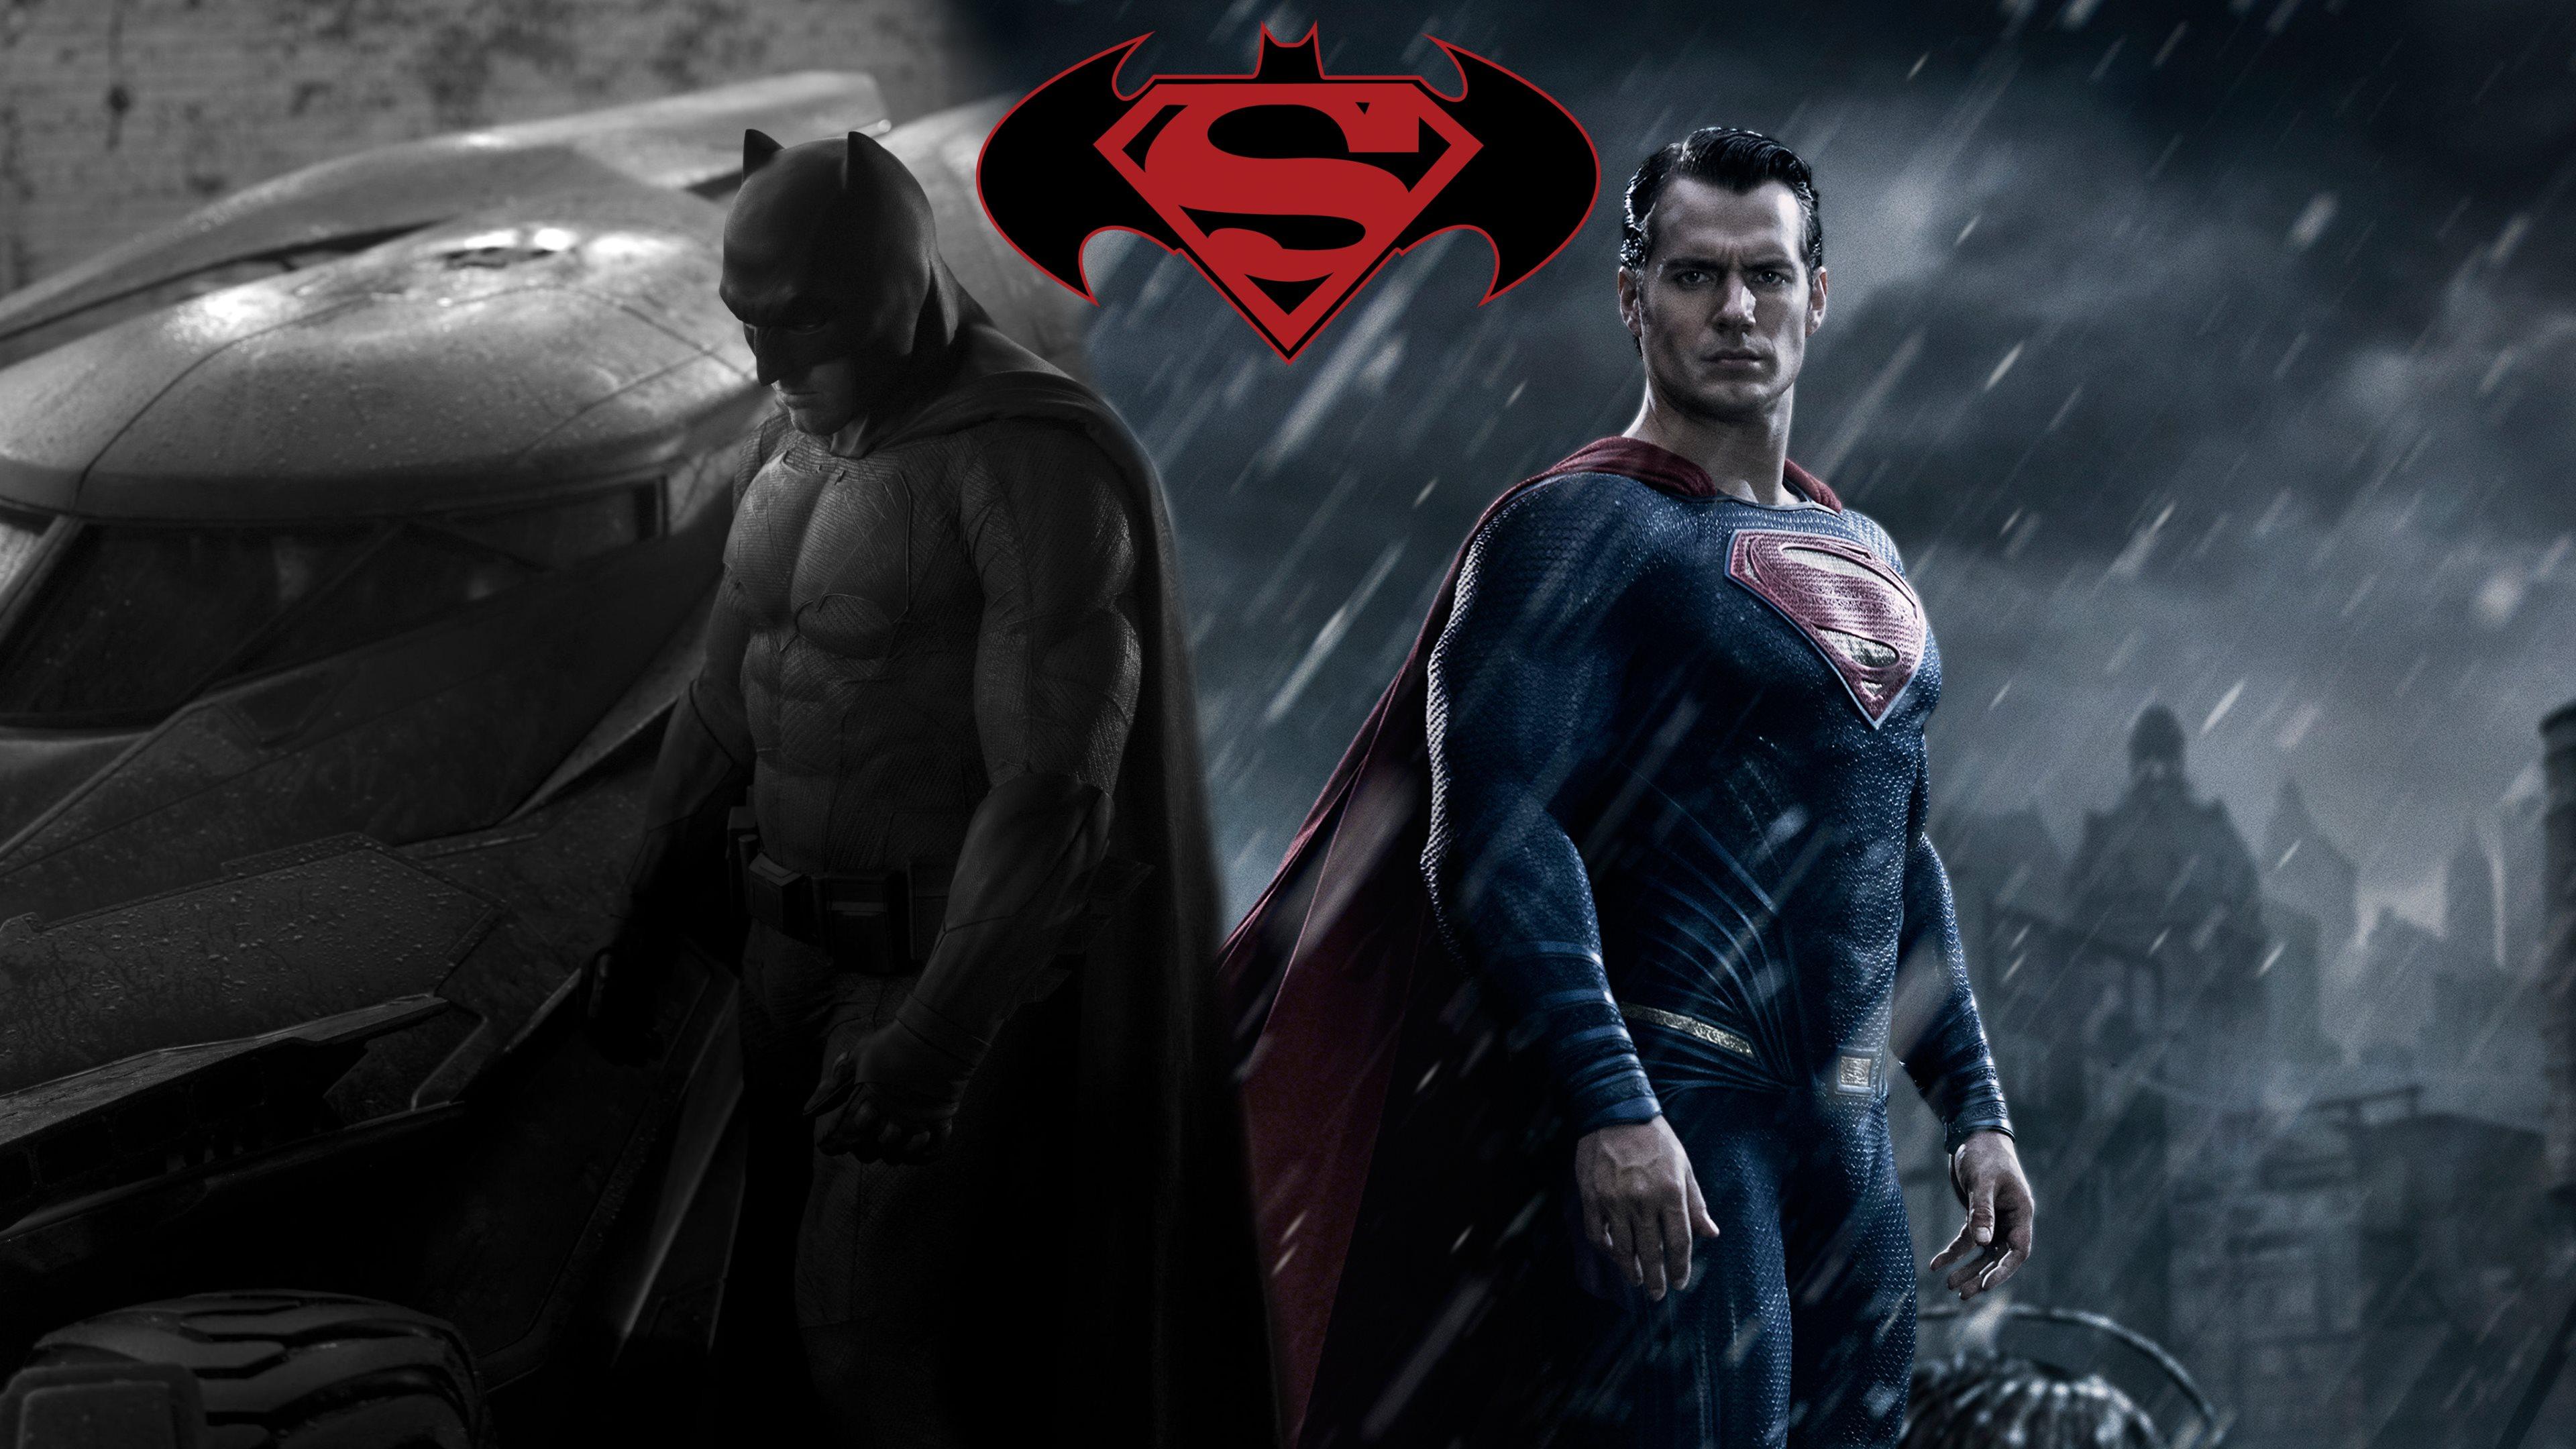 wallpapers batman superman - photo #17